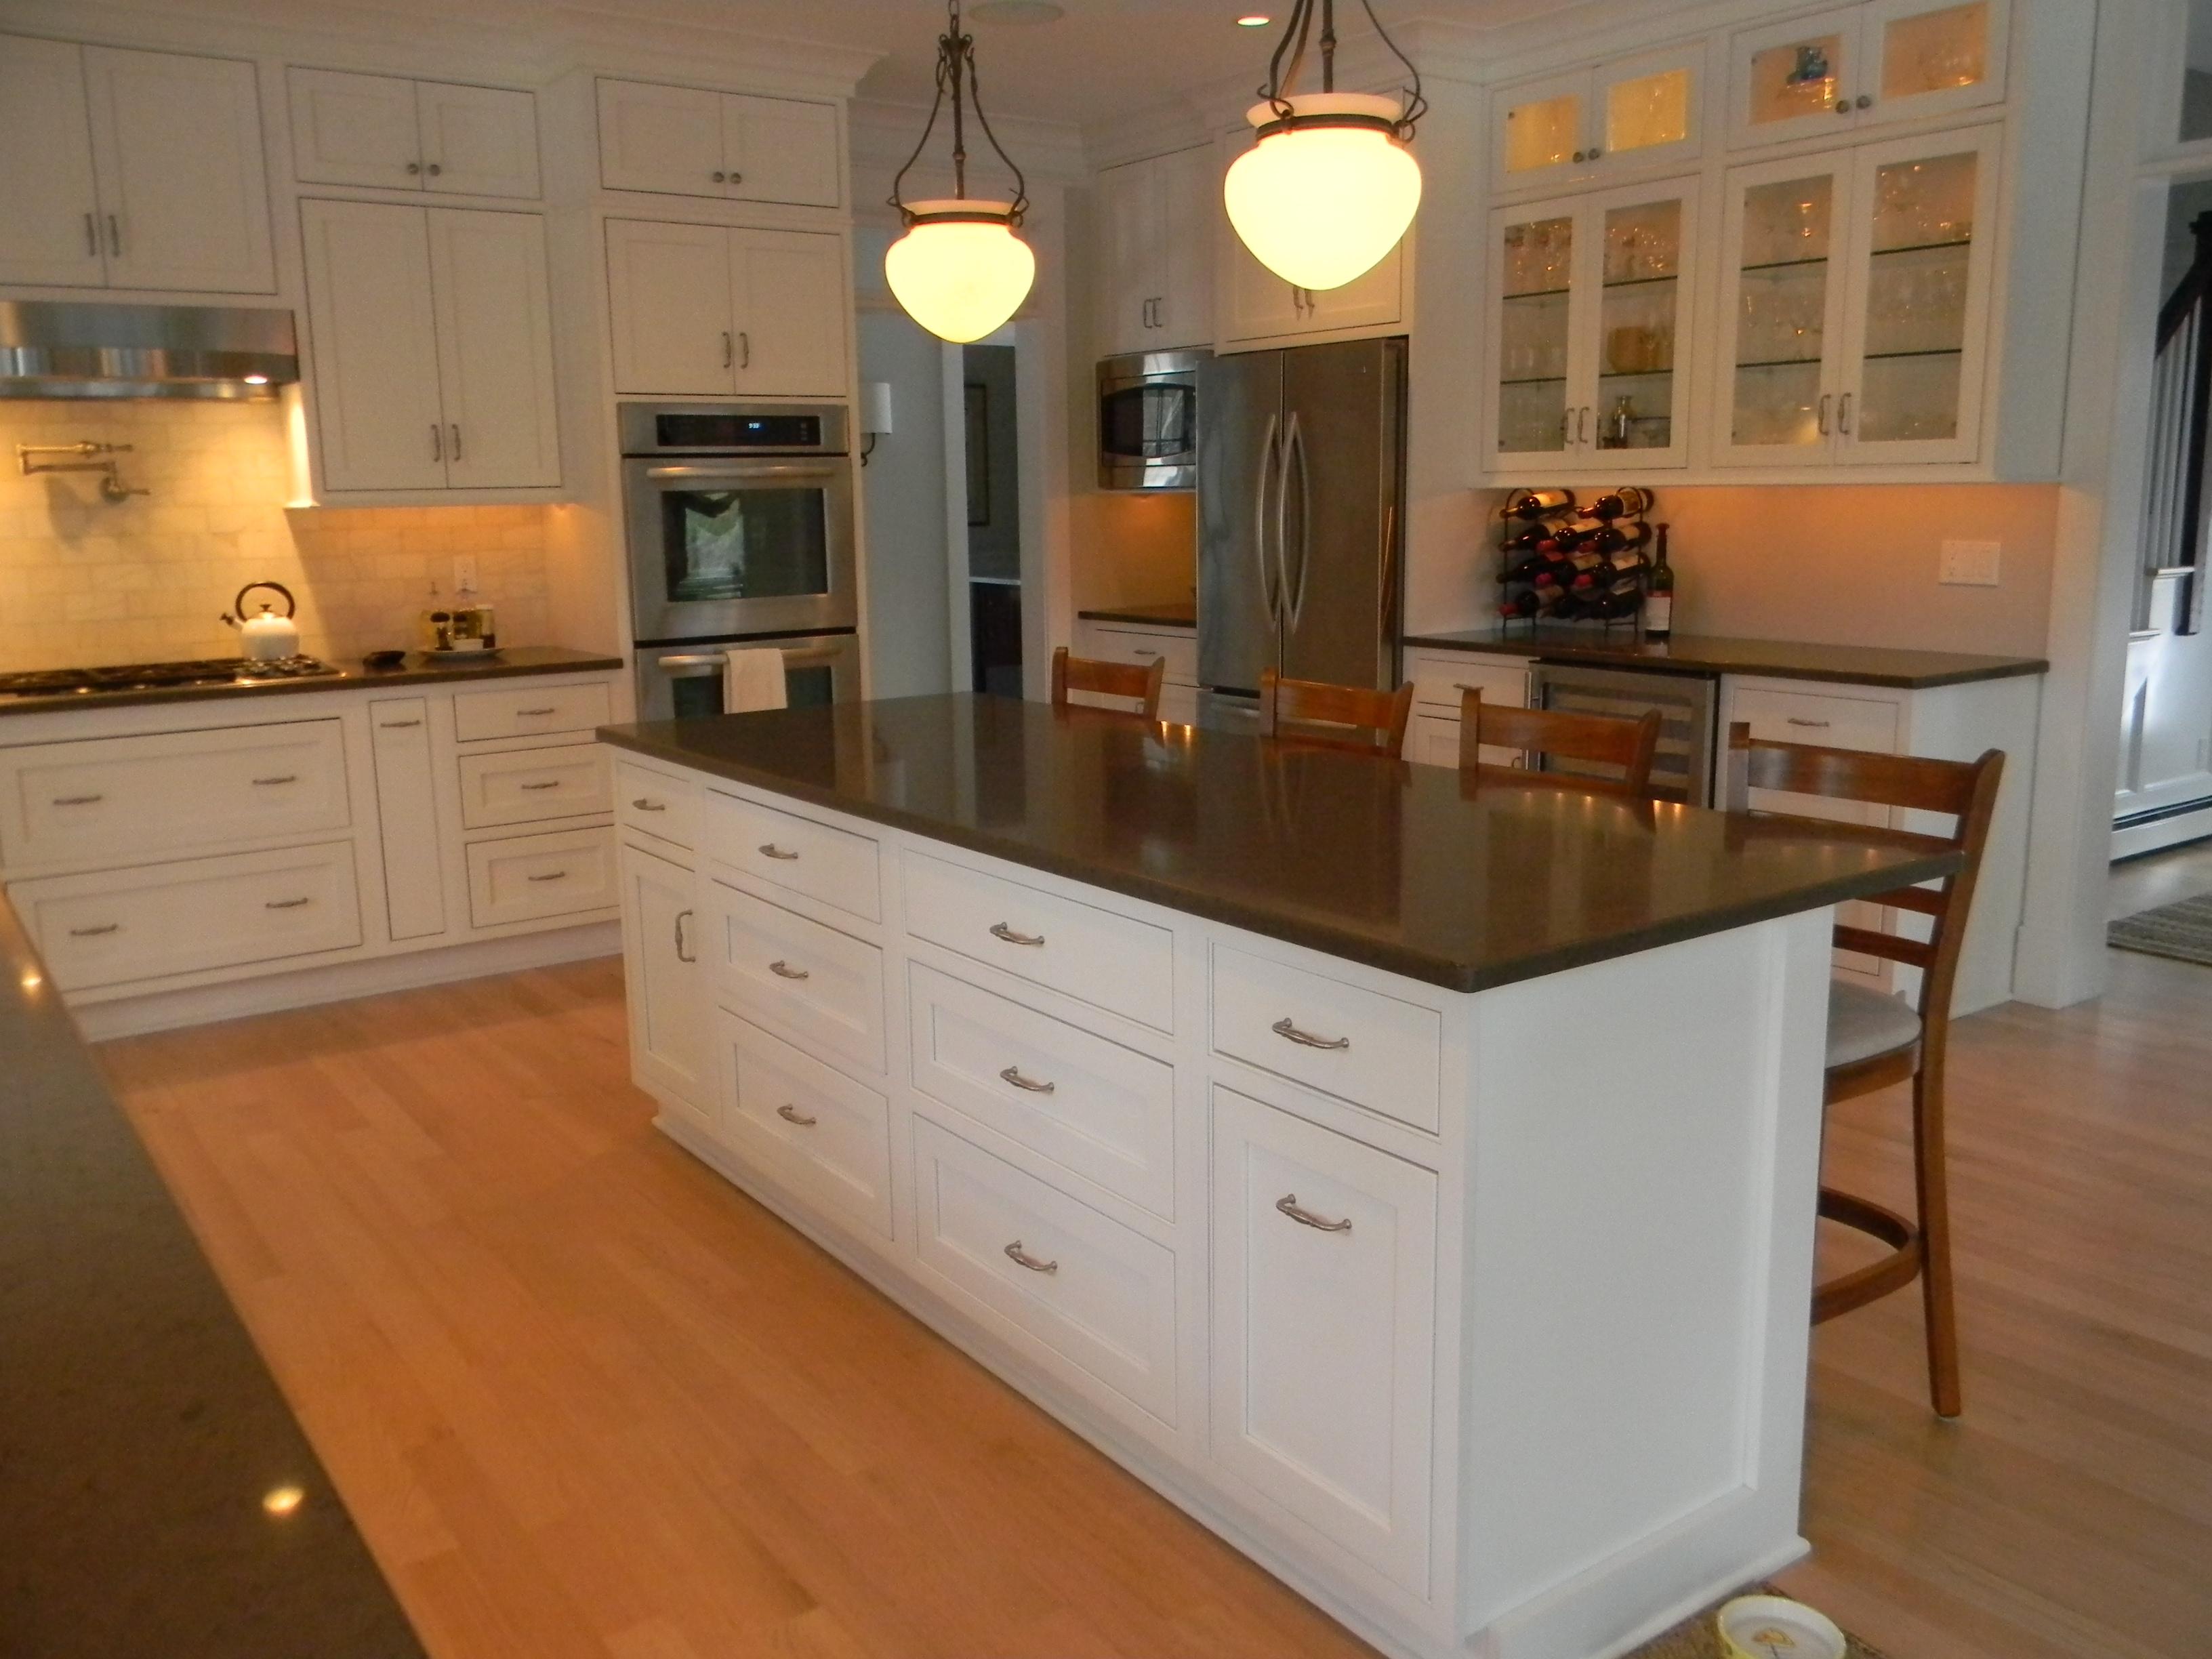 kitchen direct commercial ventilation s inc seekonk hours location